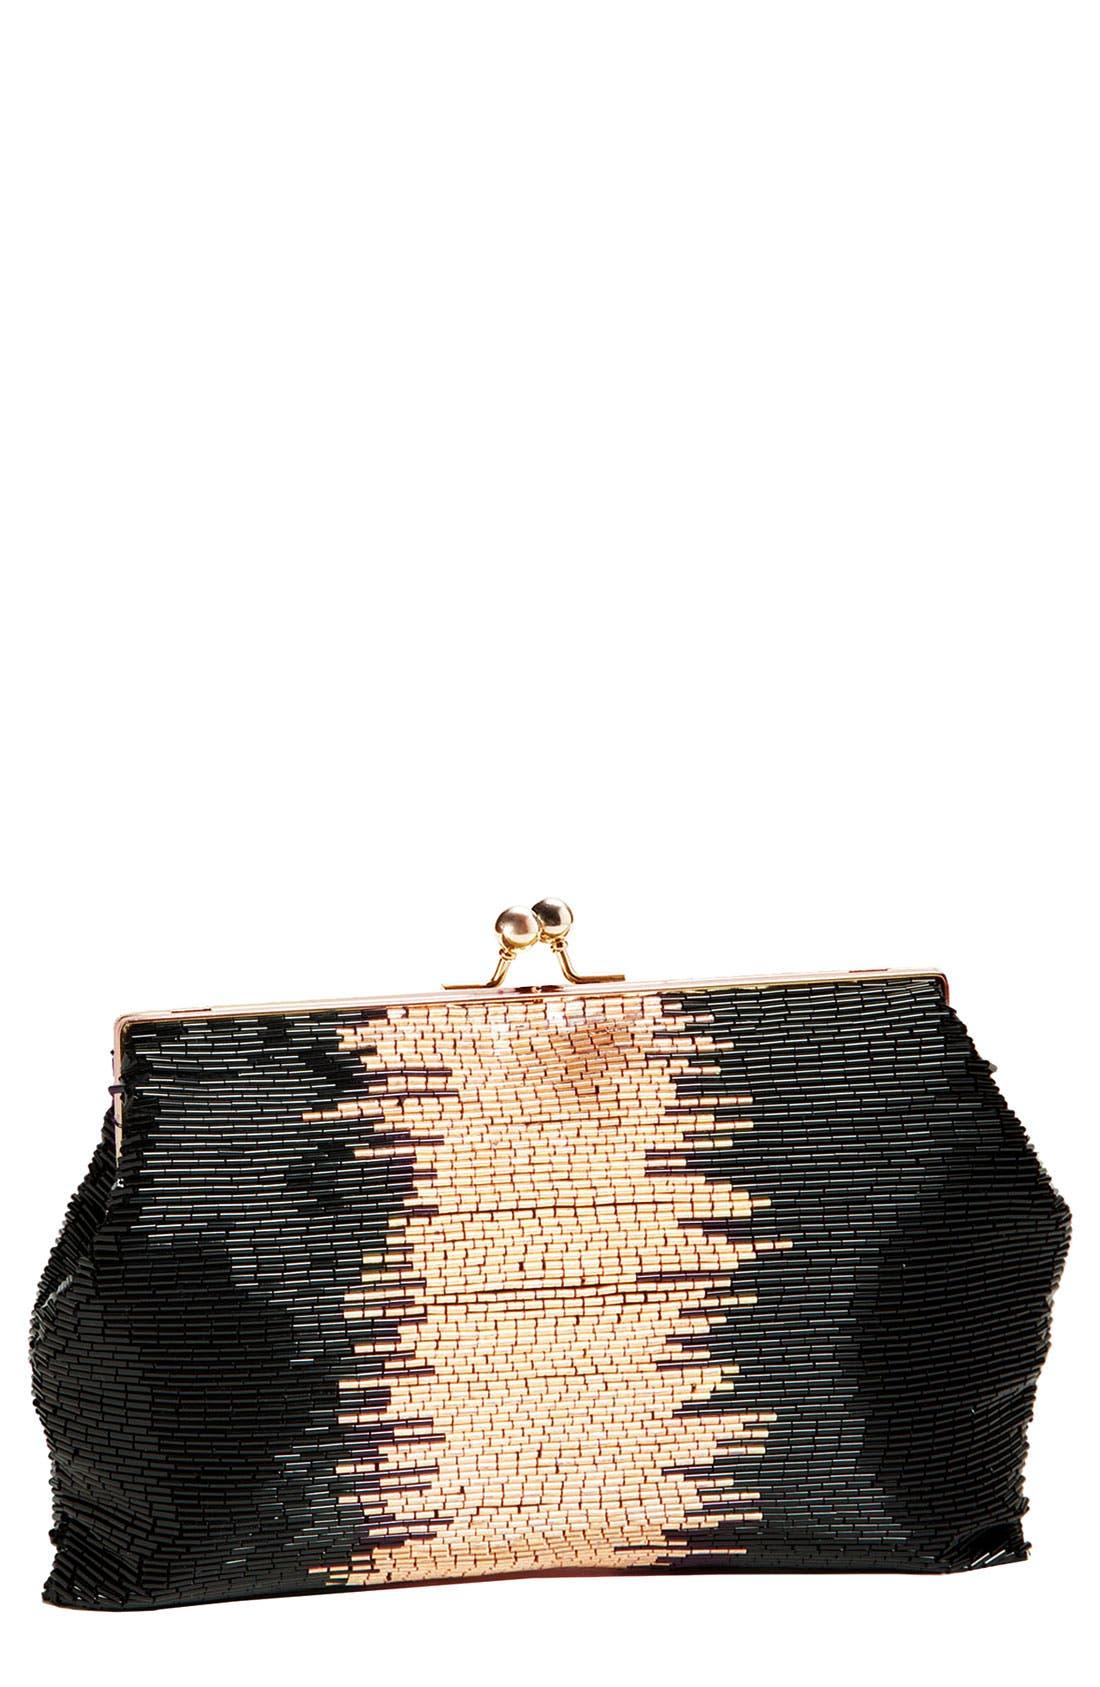 Alternate Image 1 Selected - Tasha 'Badge' Beaded Clutch